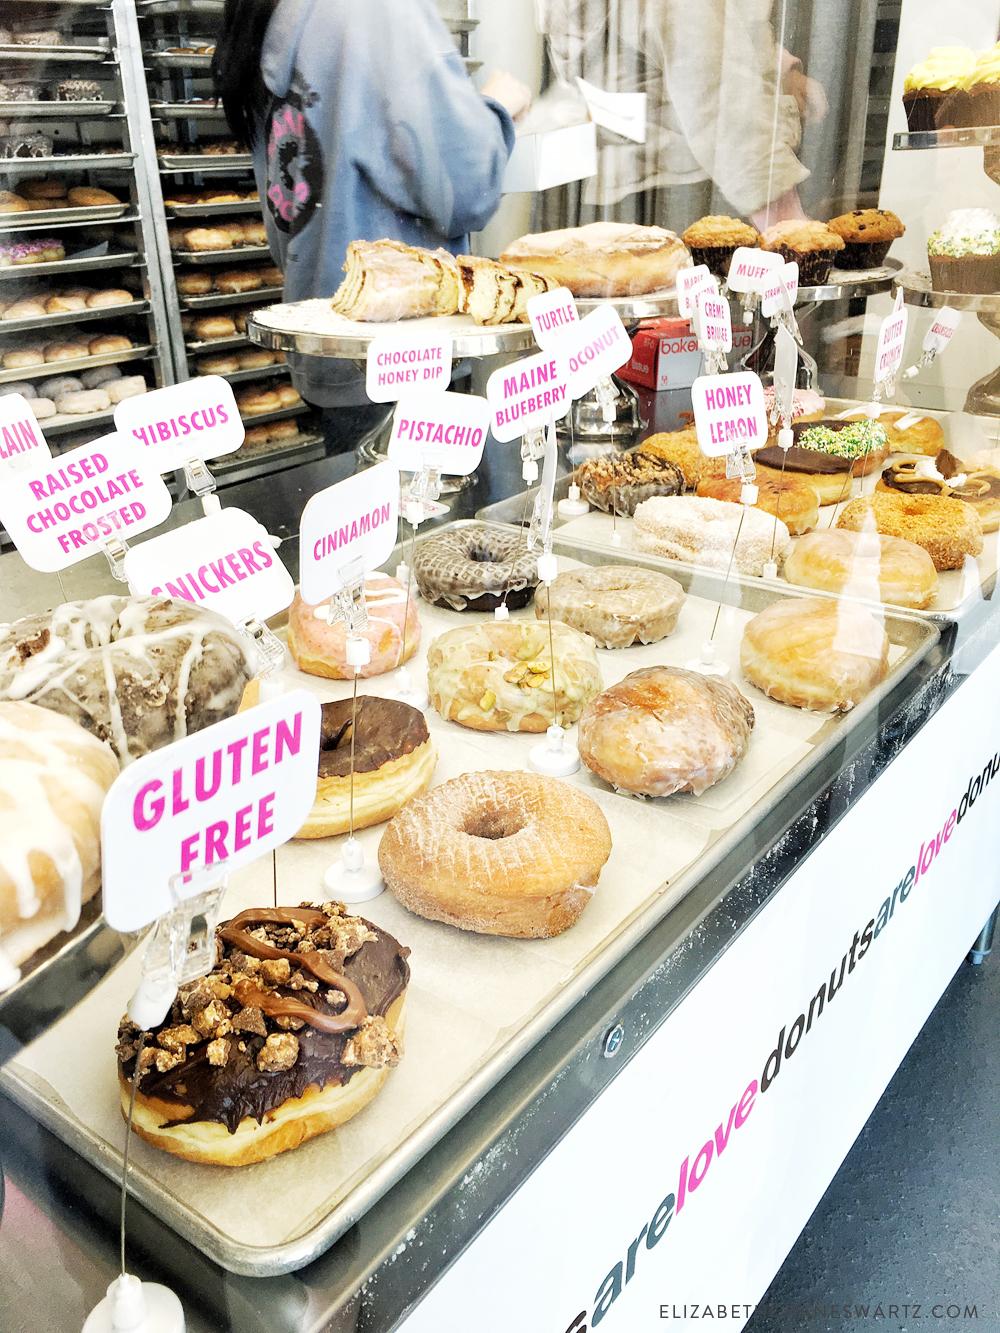 kane's donuts / elizabethcraneswartz.com